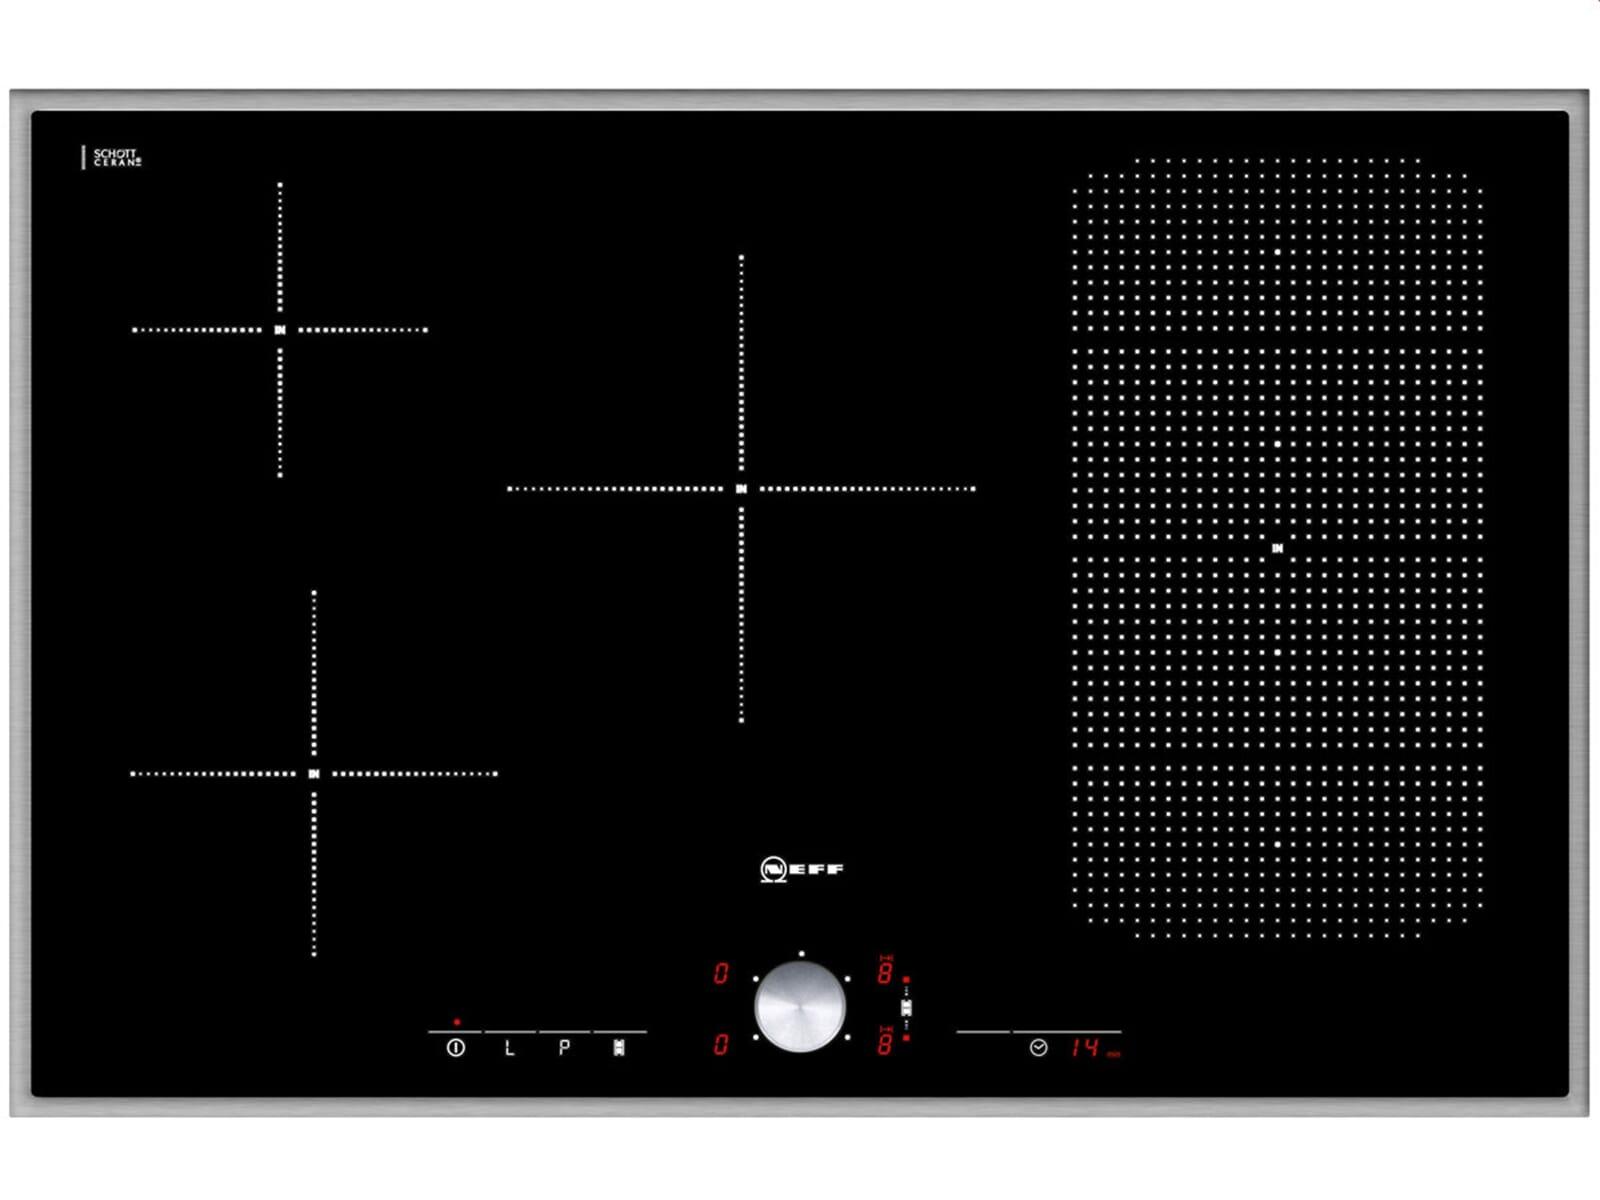 neff tt 5386 n flexinduction glaskeramik kochstelle autark herdplatte t53t86n2 ebay. Black Bedroom Furniture Sets. Home Design Ideas